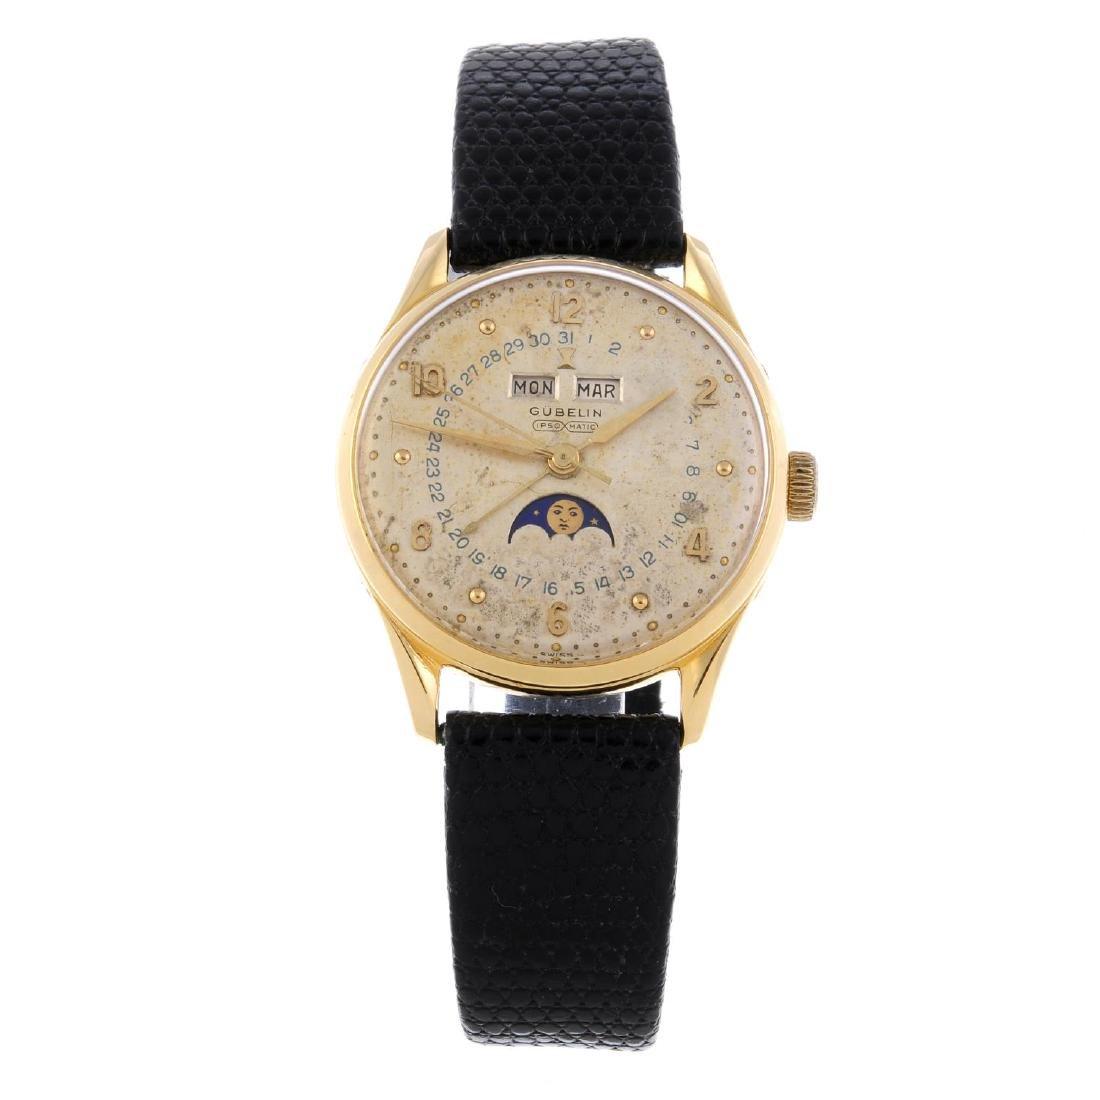 GUBELIN - a gentleman's Ipsomatic wrist watch. Yellow